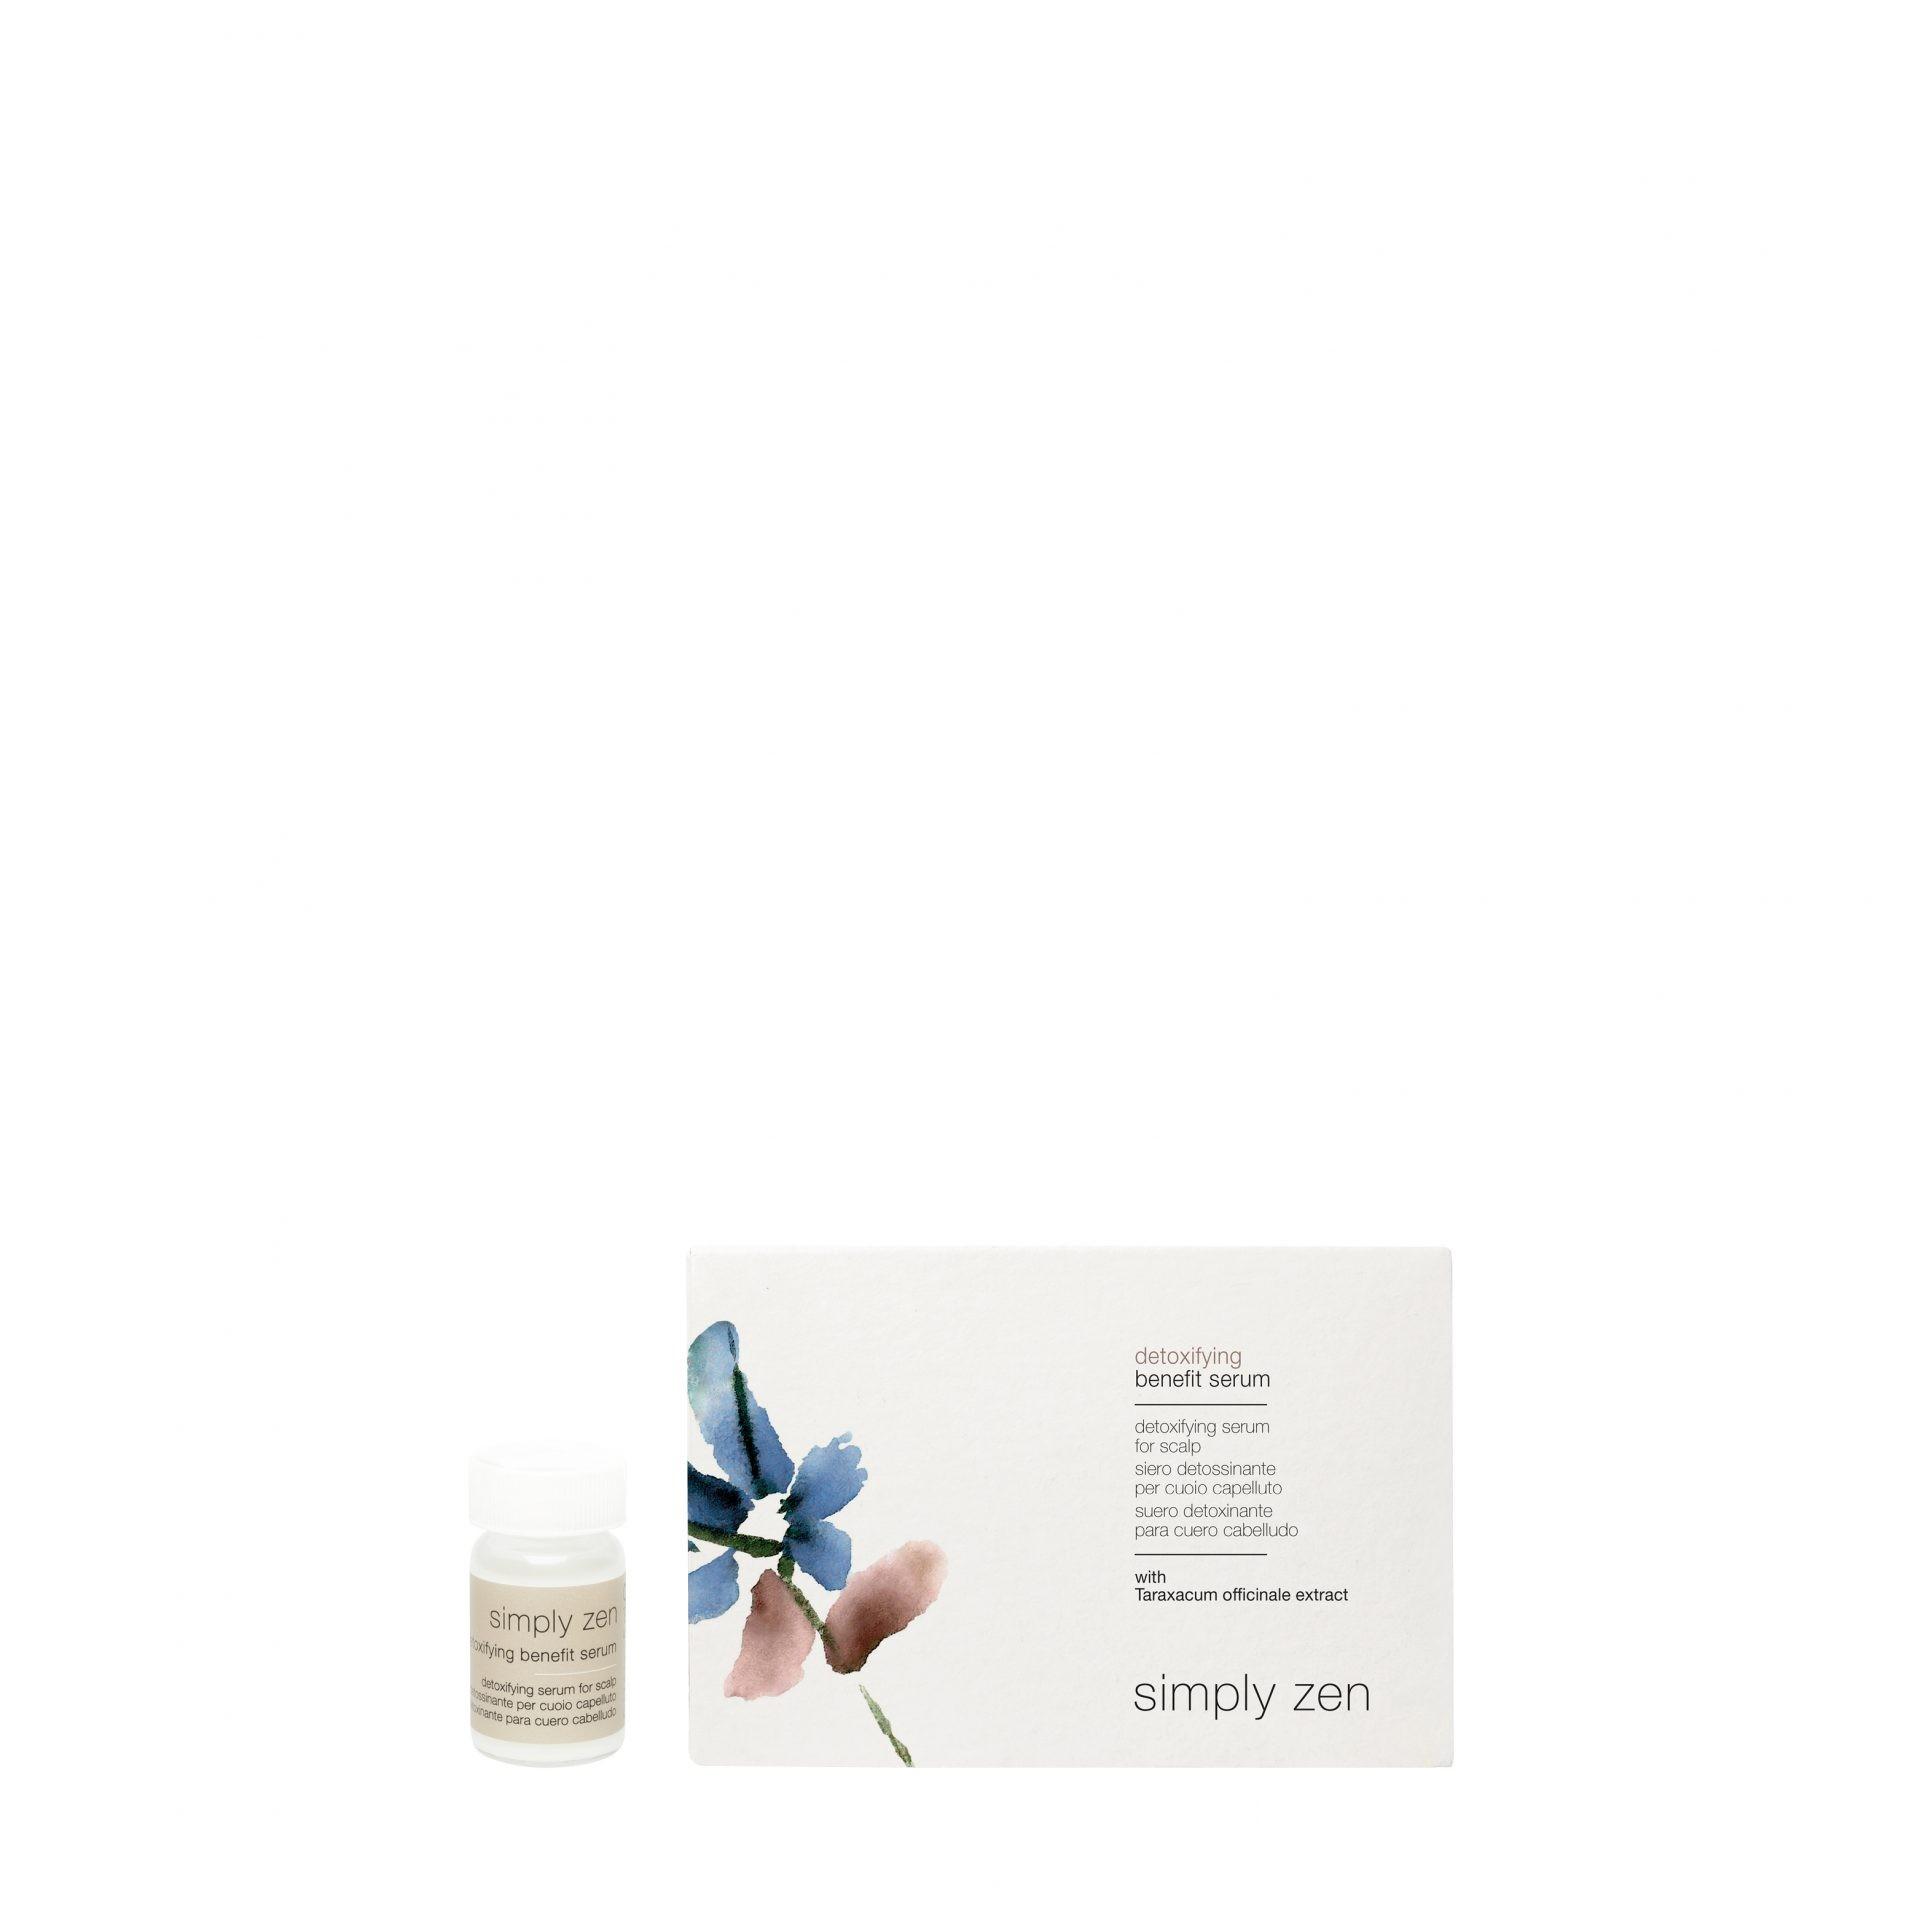 12 IMG SZ singole prodotti 1500x1500px 72 DPI detoxi fying serum